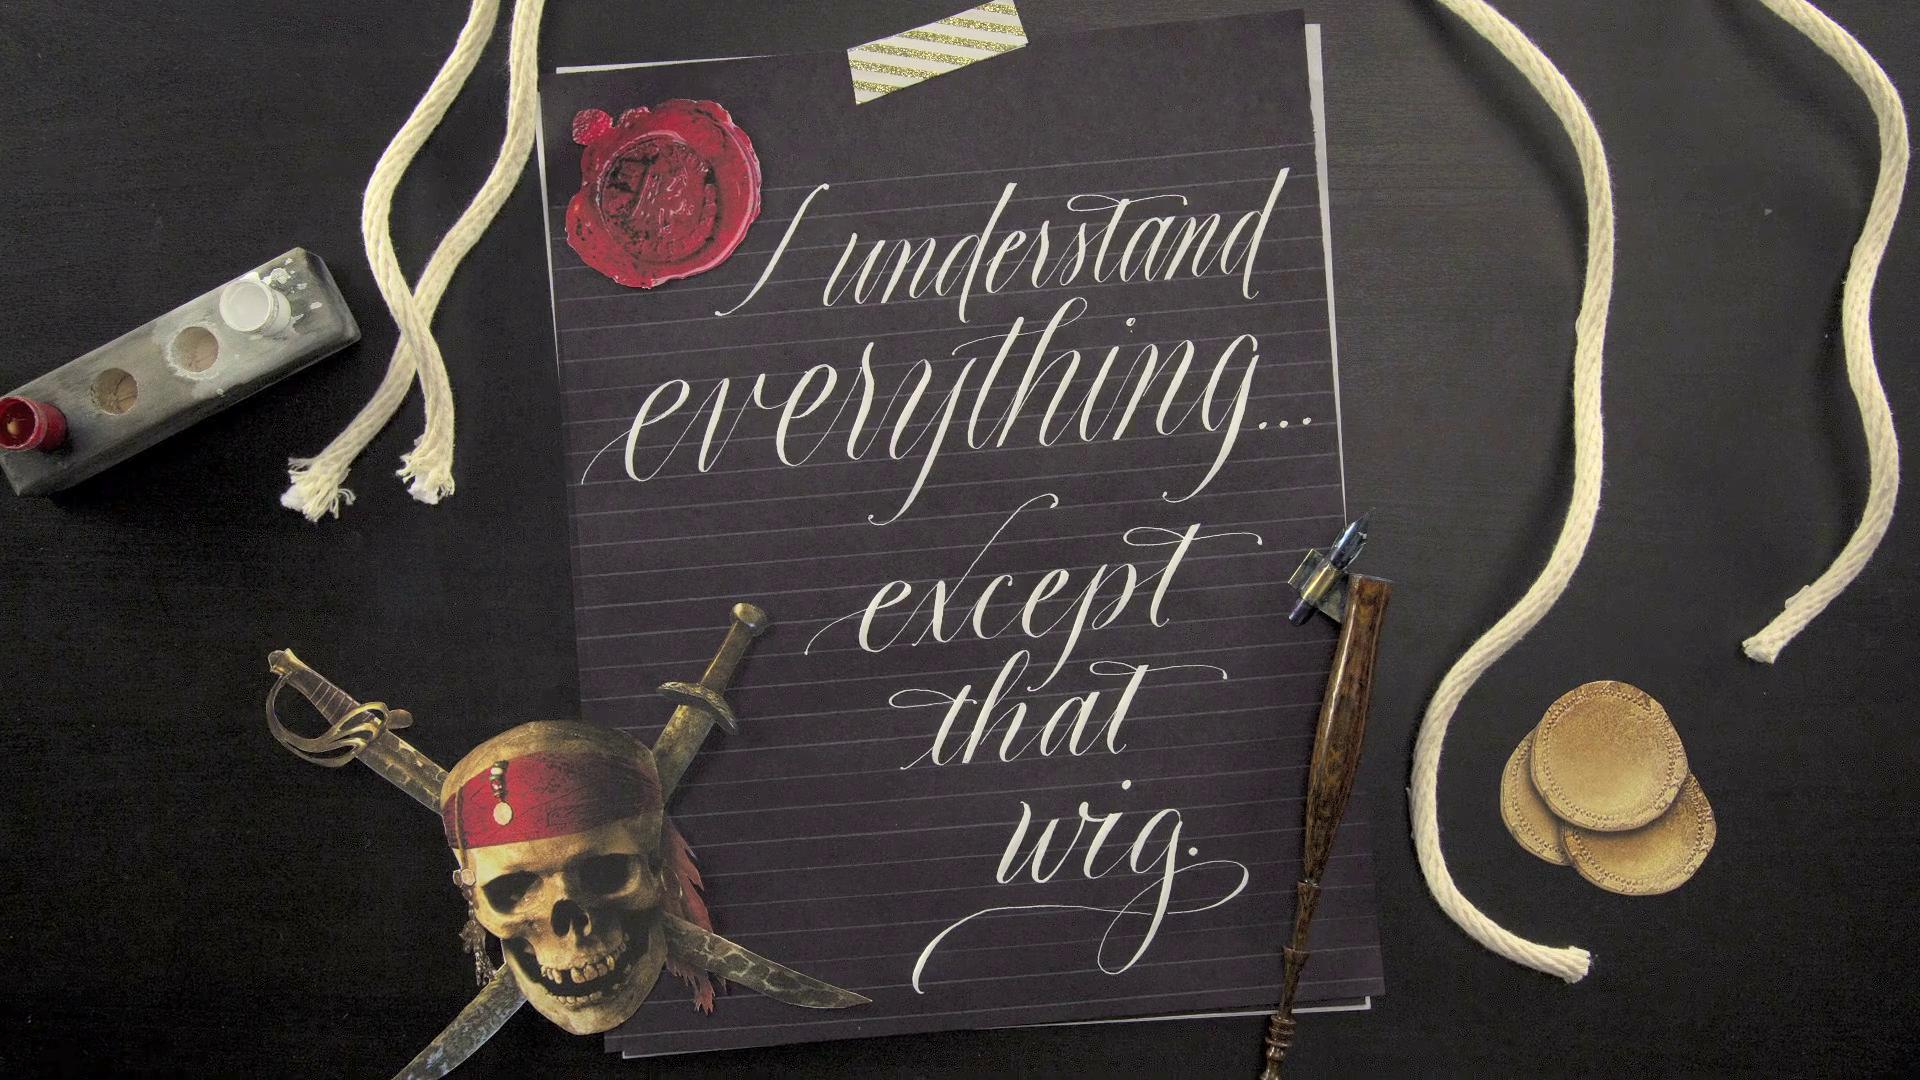 Calligraphy Artist Creates Amazing Disney Comeback Quotes Part 02 | Oh My Disney